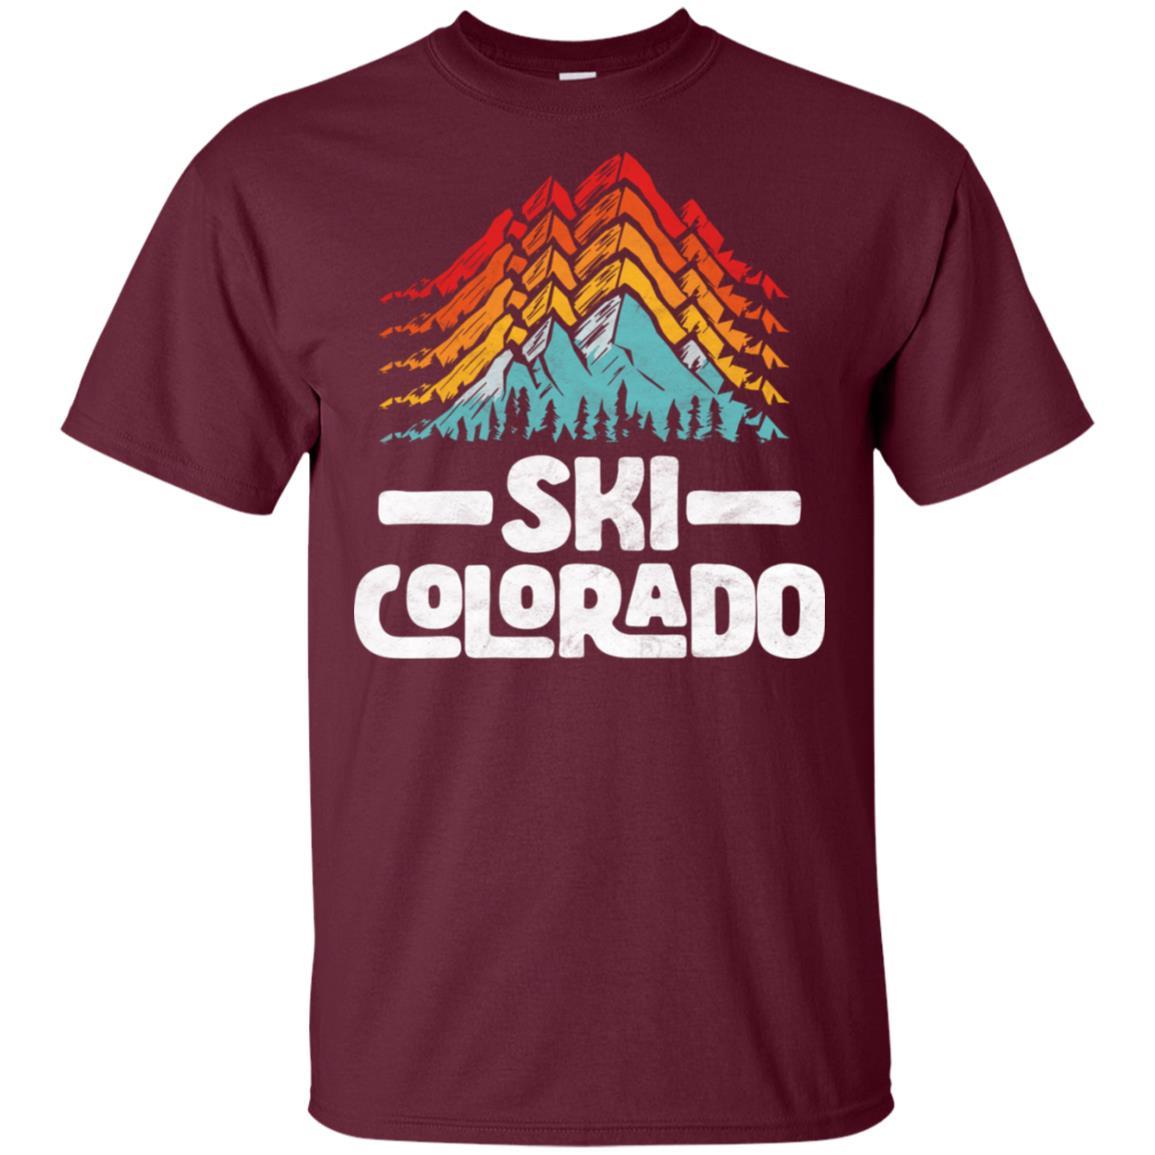 Ski Colorado Vintage 80s Mountains Unisex Short Sleeve